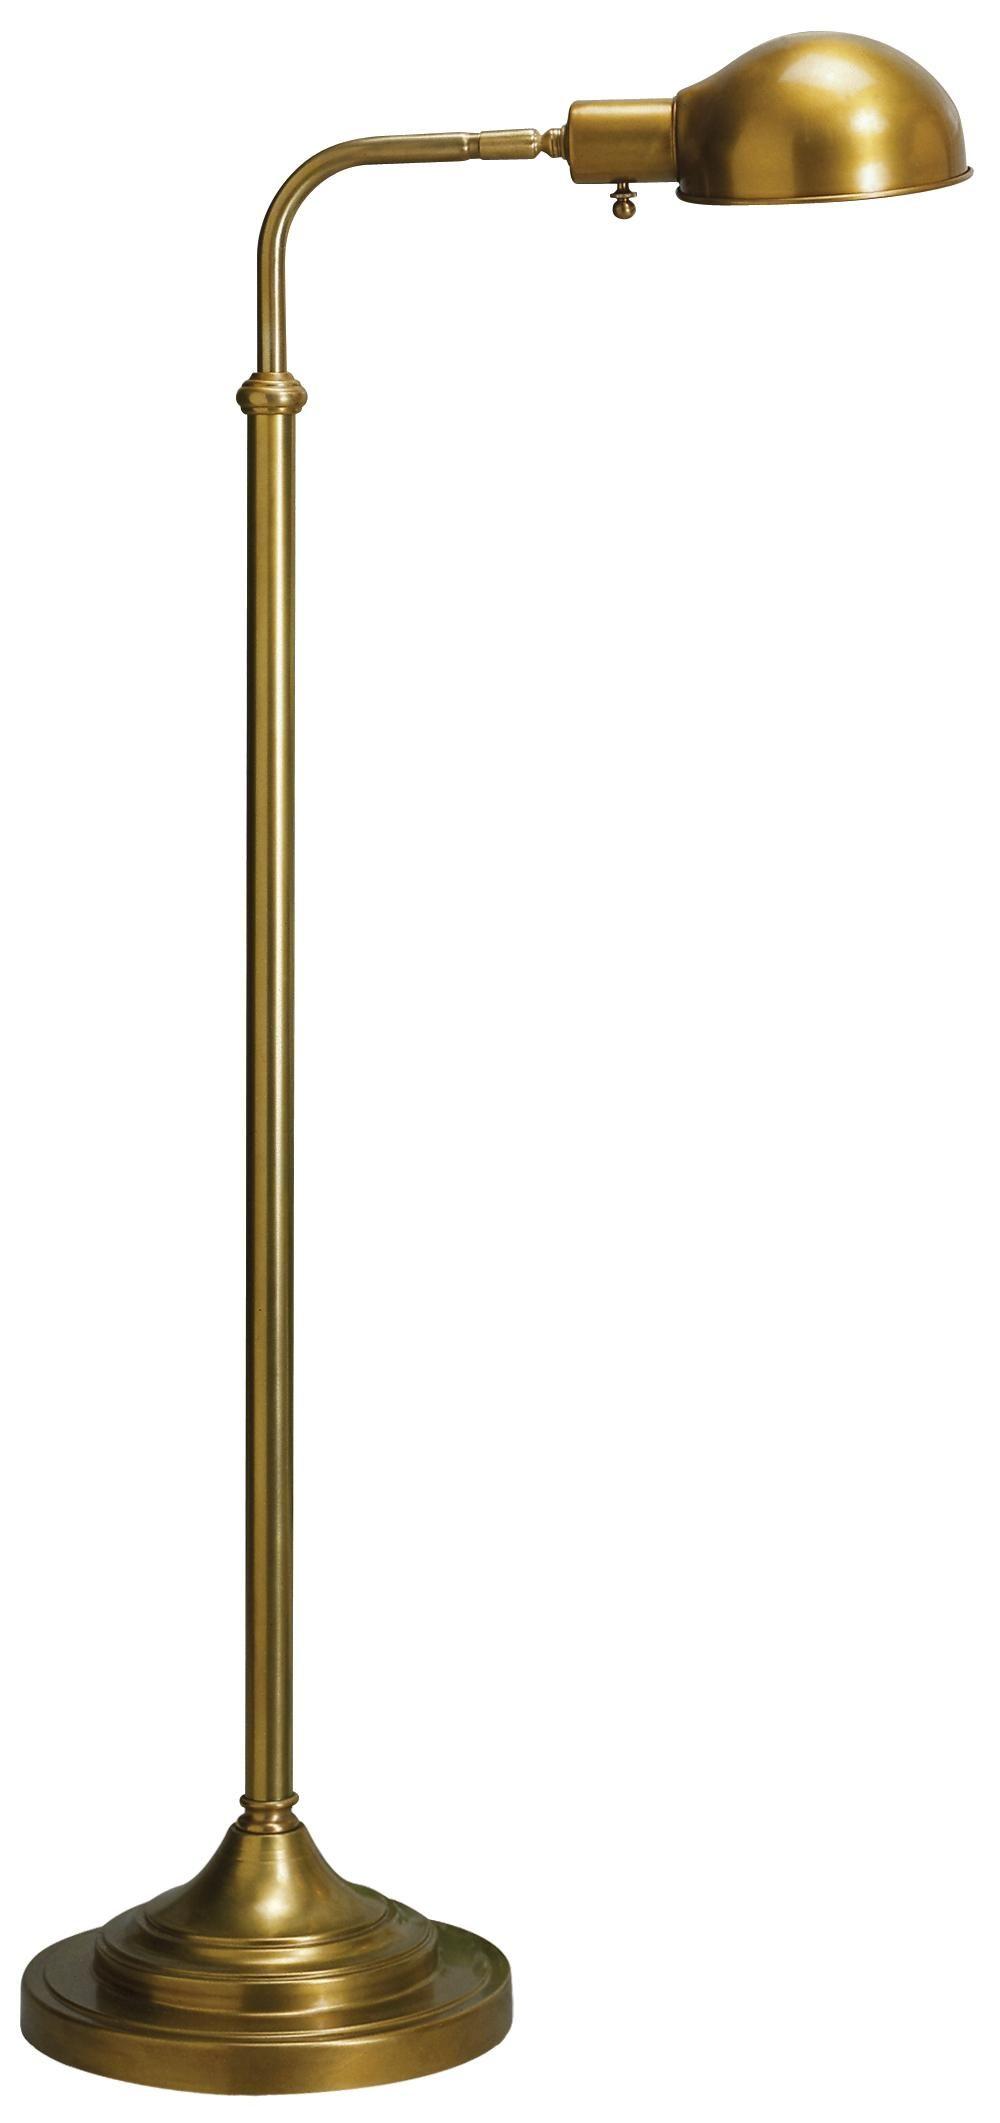 Robert Abbey Kinetic Antique Brass Pharmacy Floor Lamp